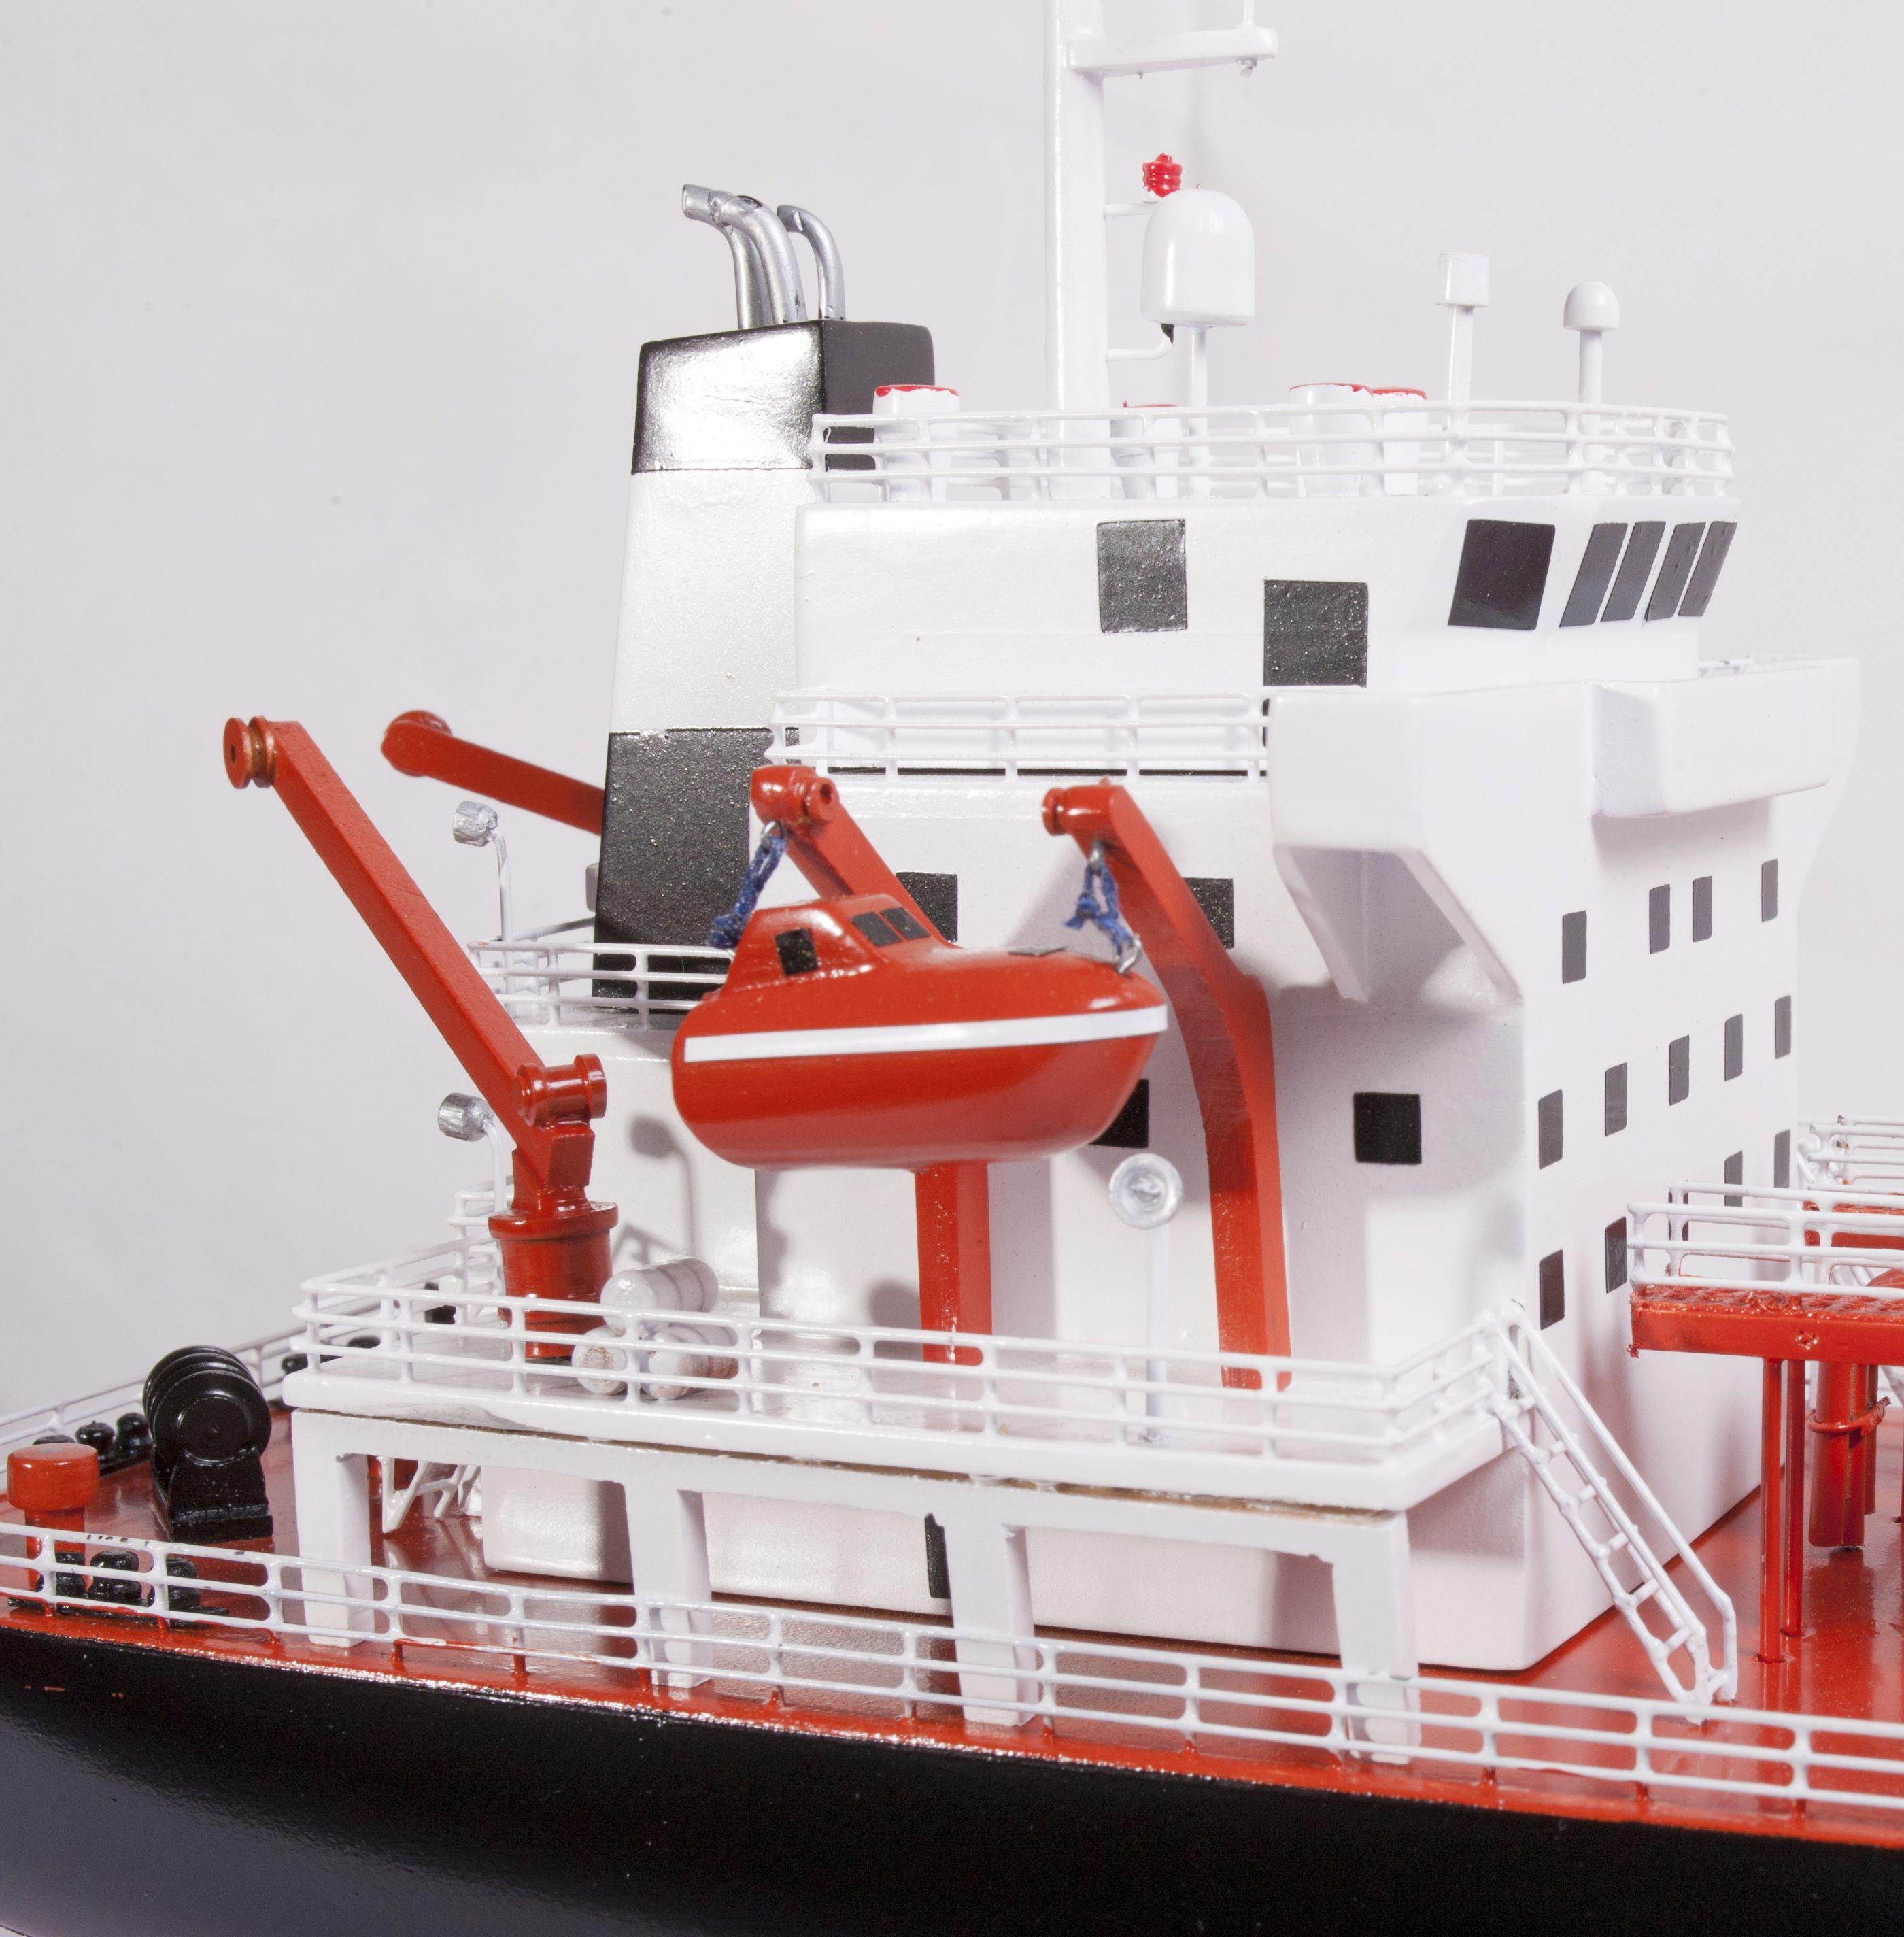 1522-9060-Mado-LPG-Tanker